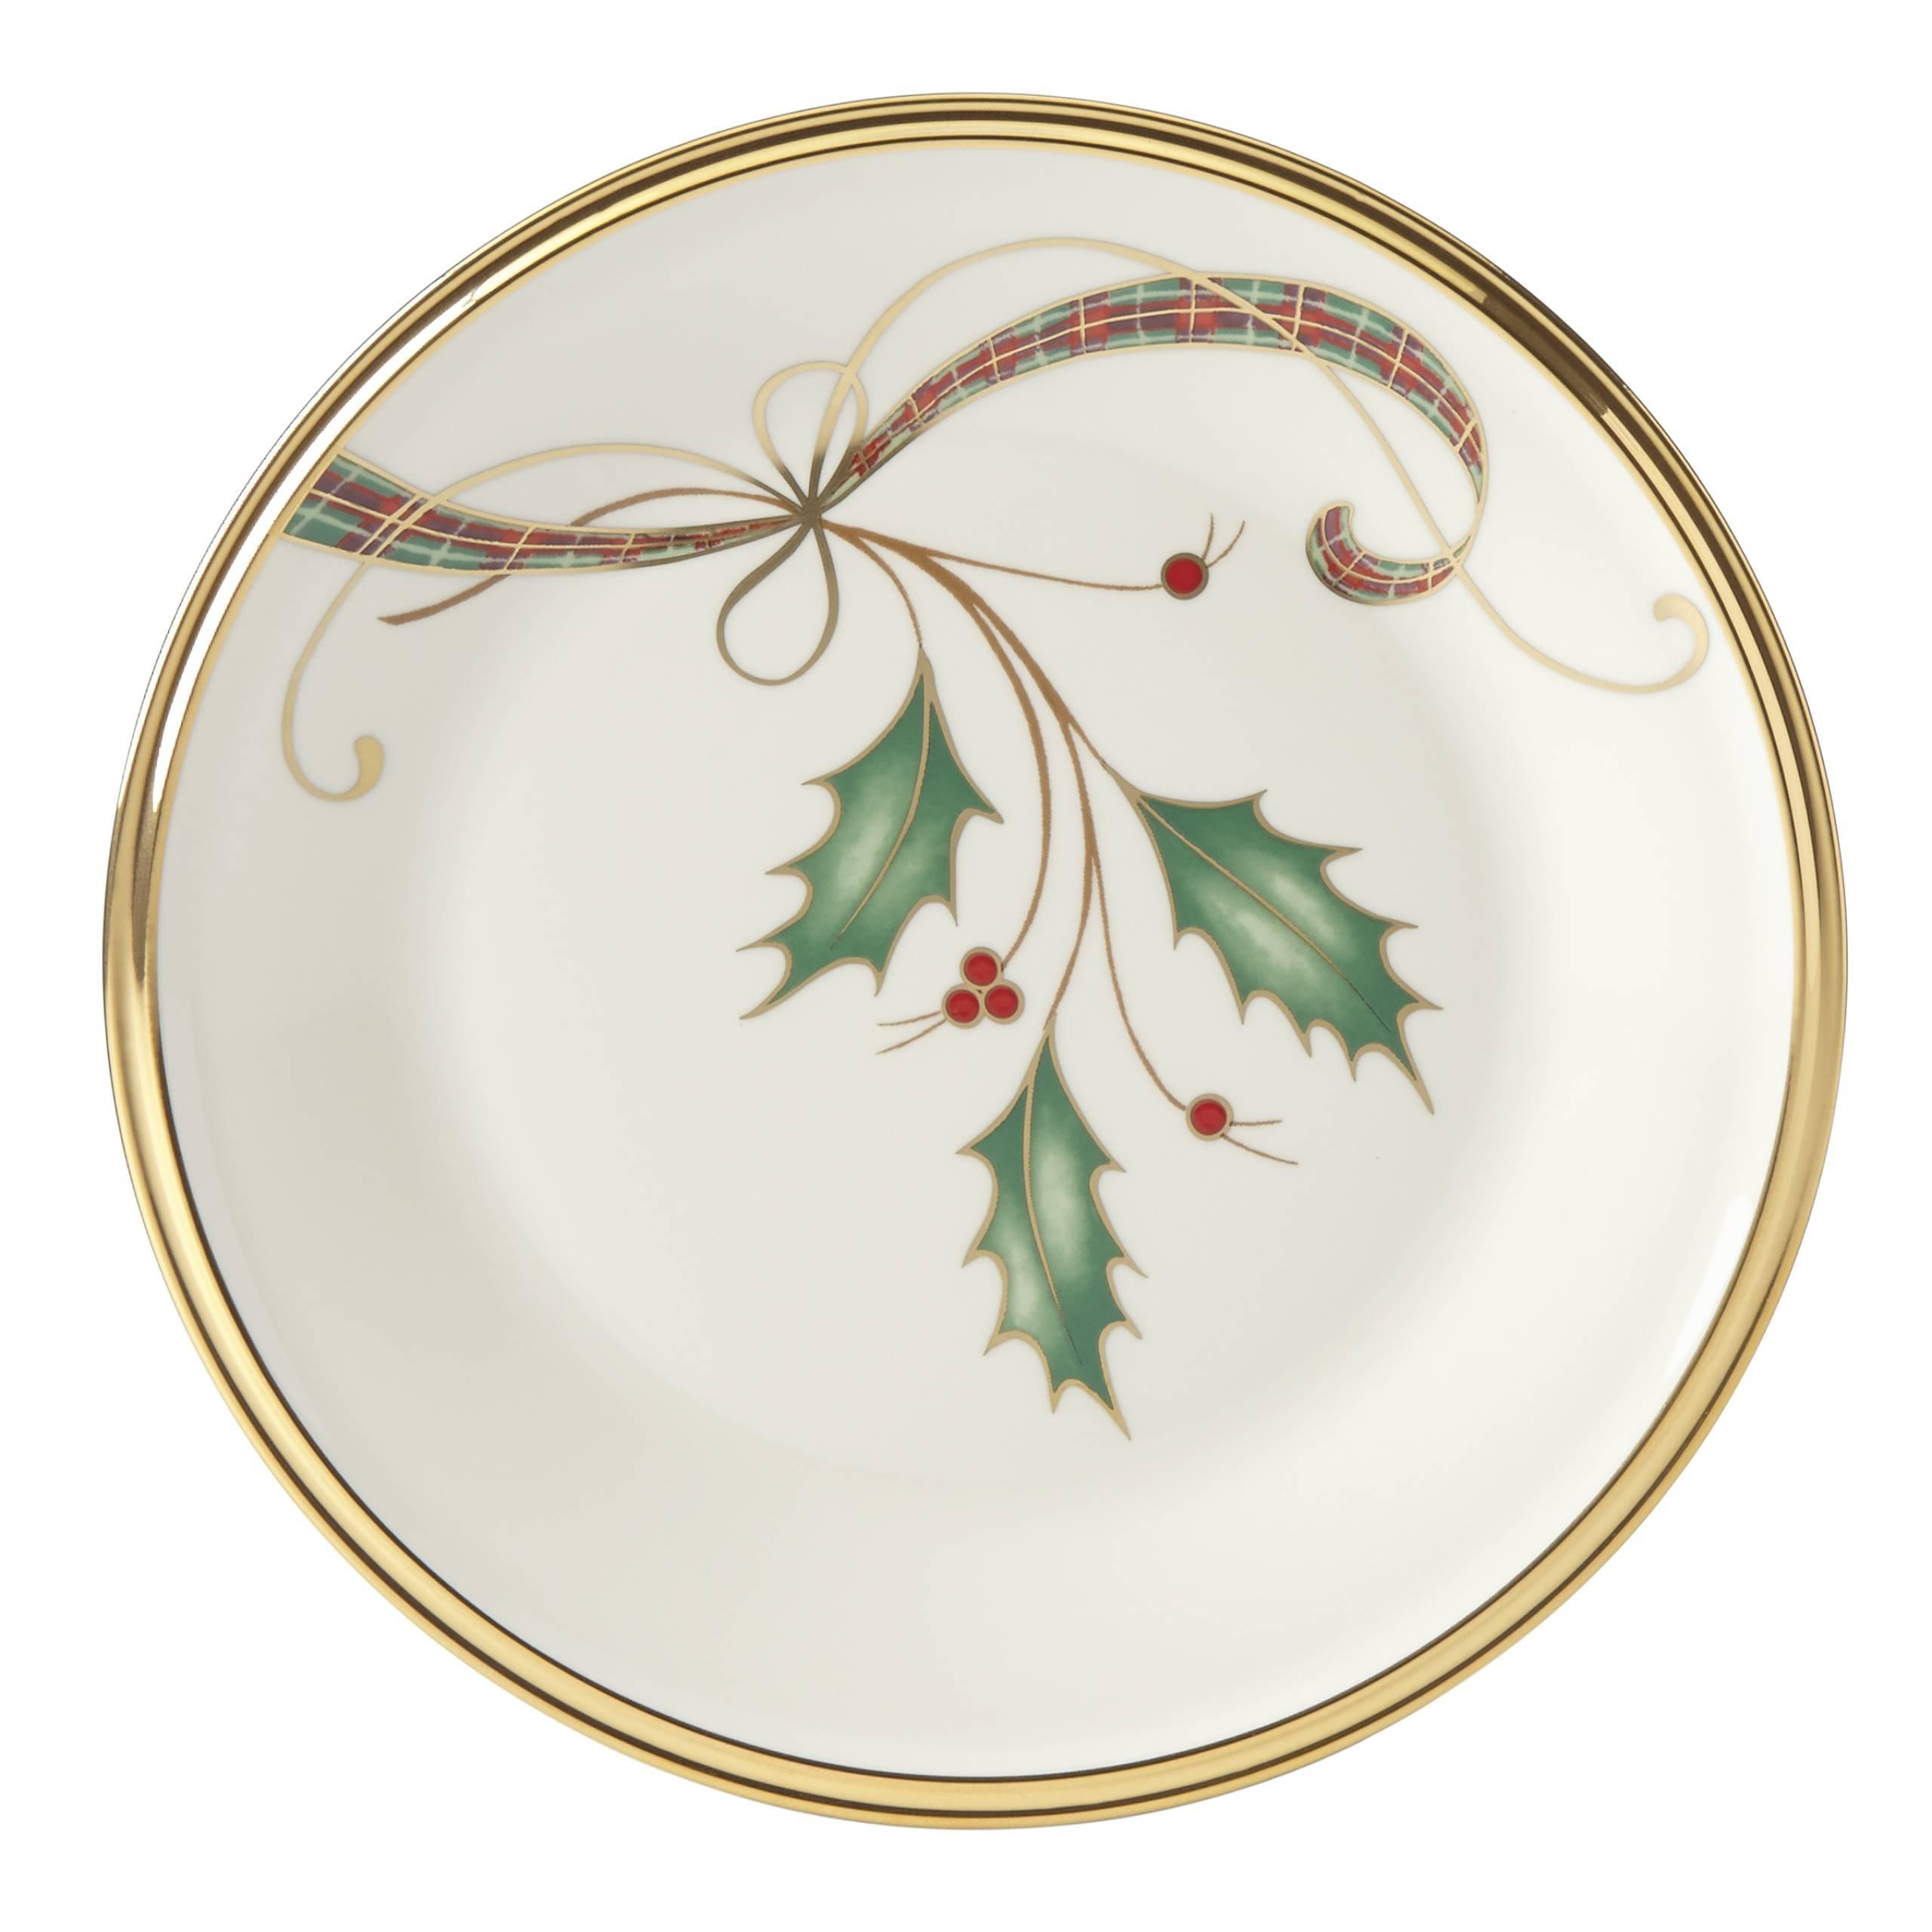 Lenox Holiday Nouveau Gold Butter Plate